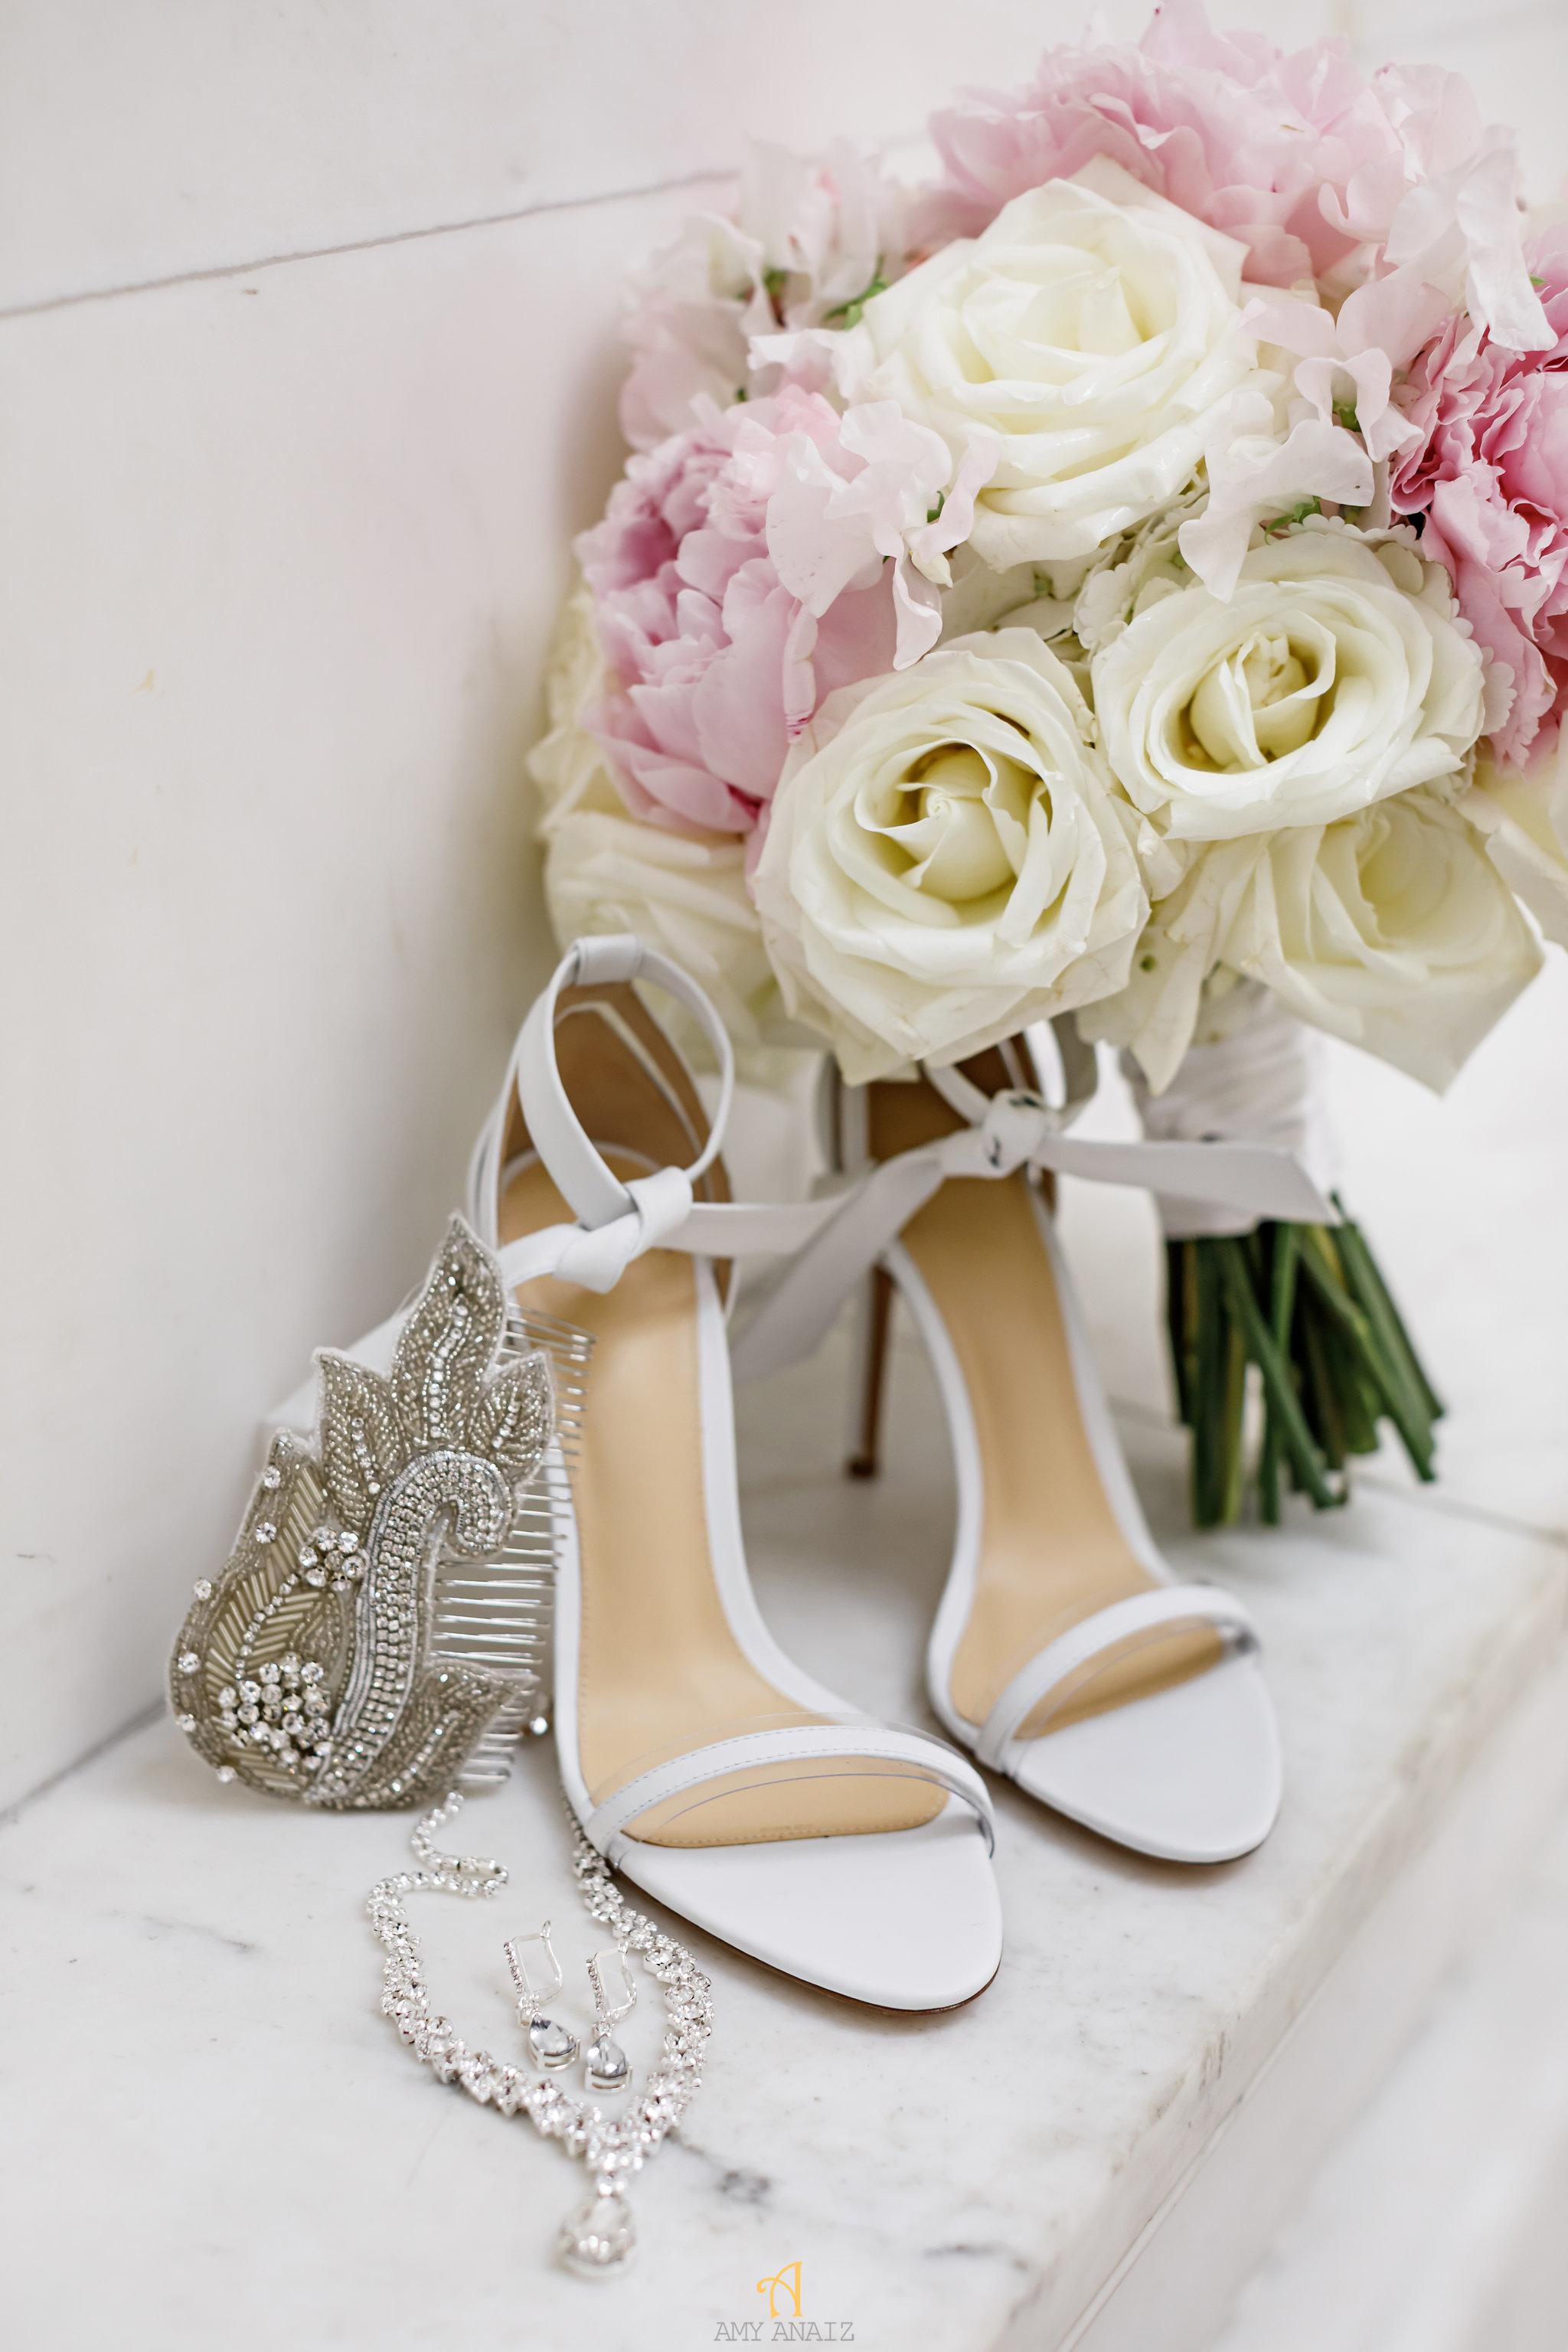 NYIT de Serversky Mansion Wedding, Wedding Shoes, Wedding Bouquet.JPG